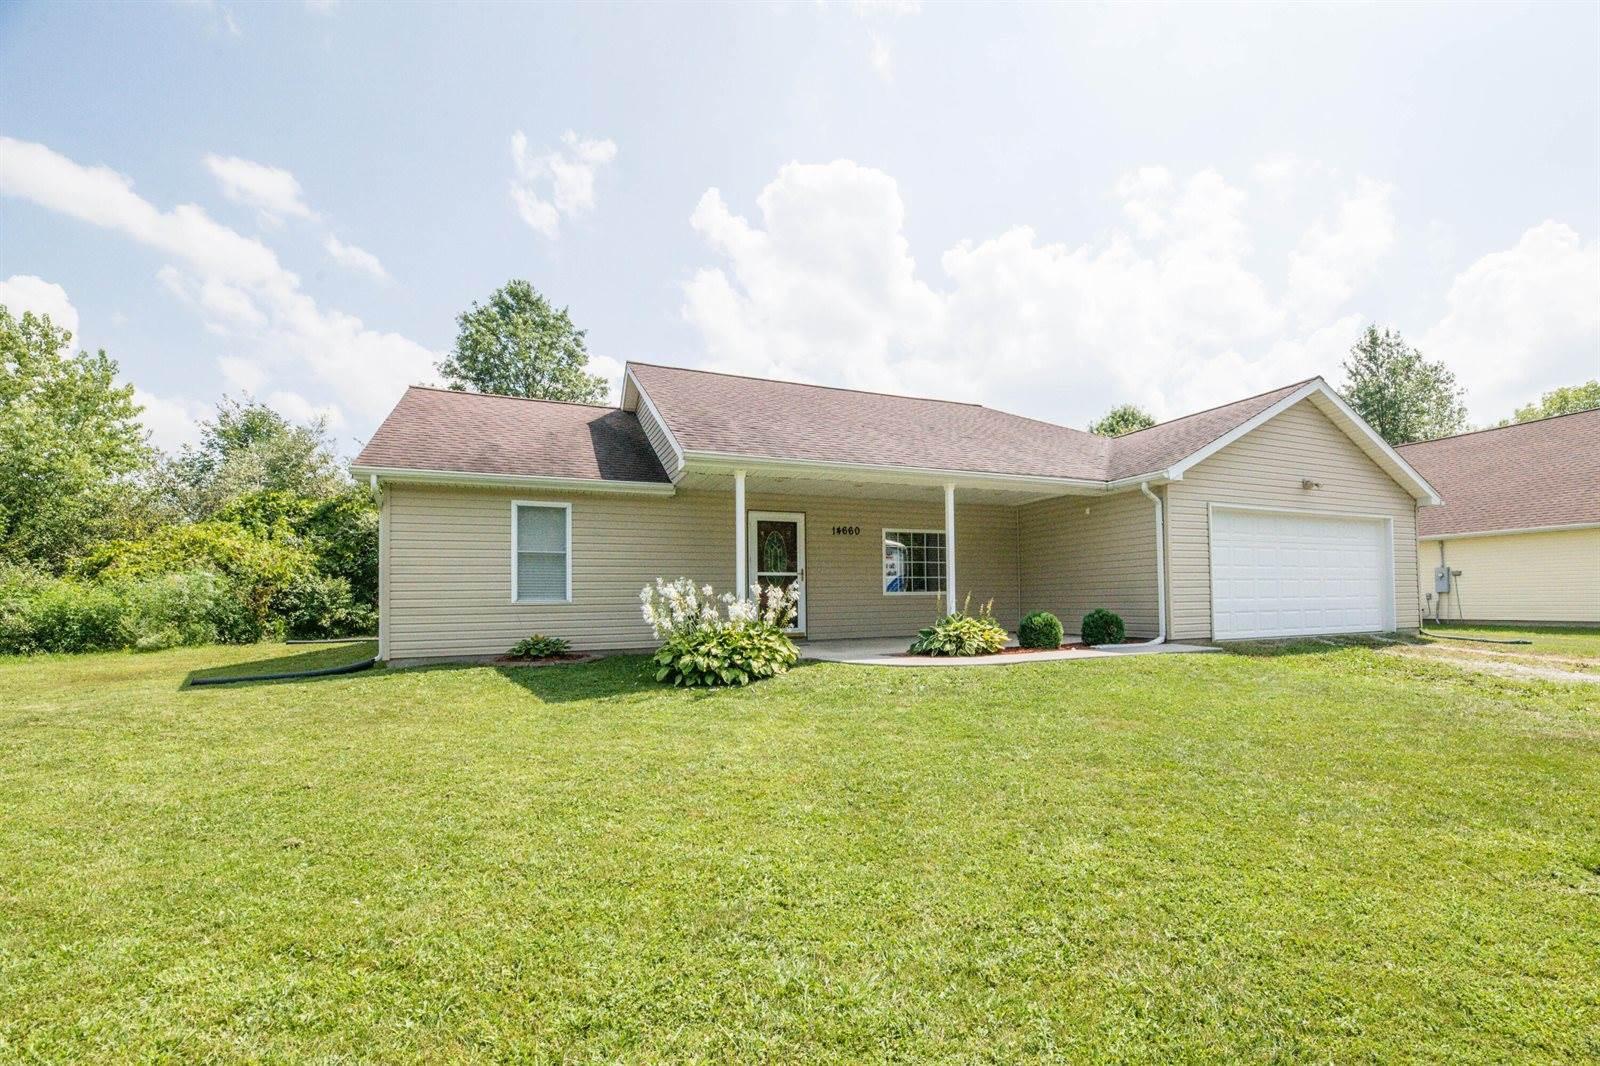 14660 North Sunnyslope, Hallsville, MO 65255